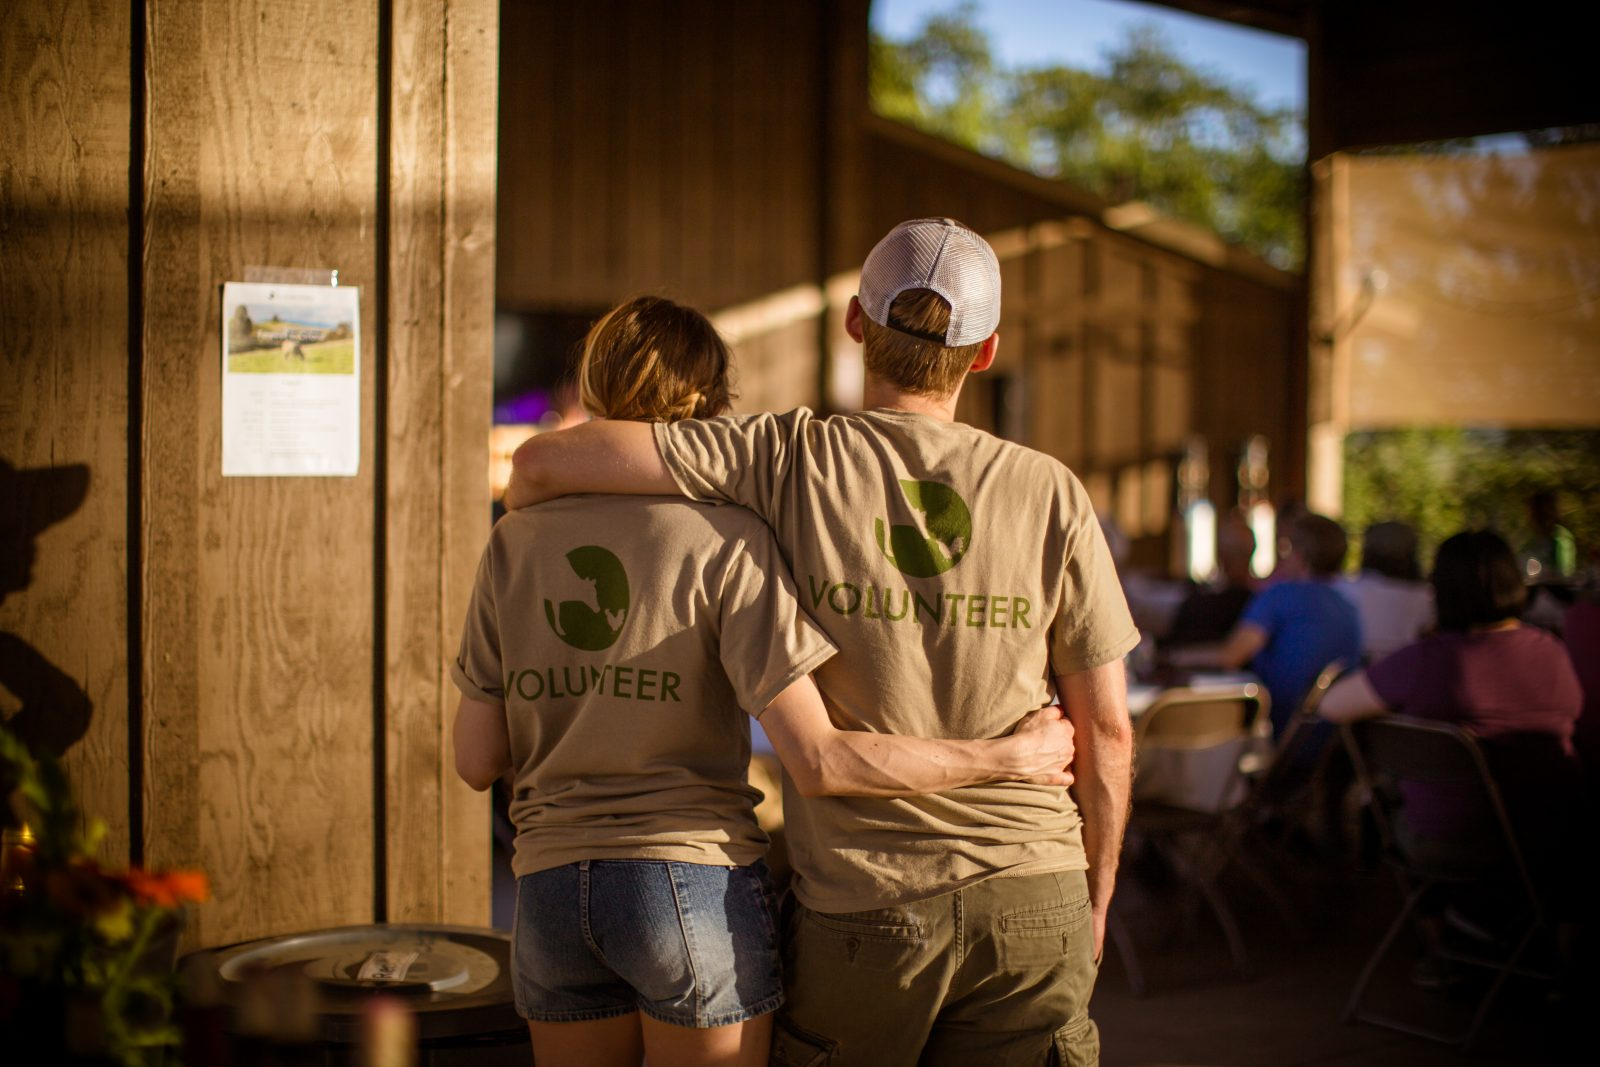 Volunteers at a Farm Sanctuary event